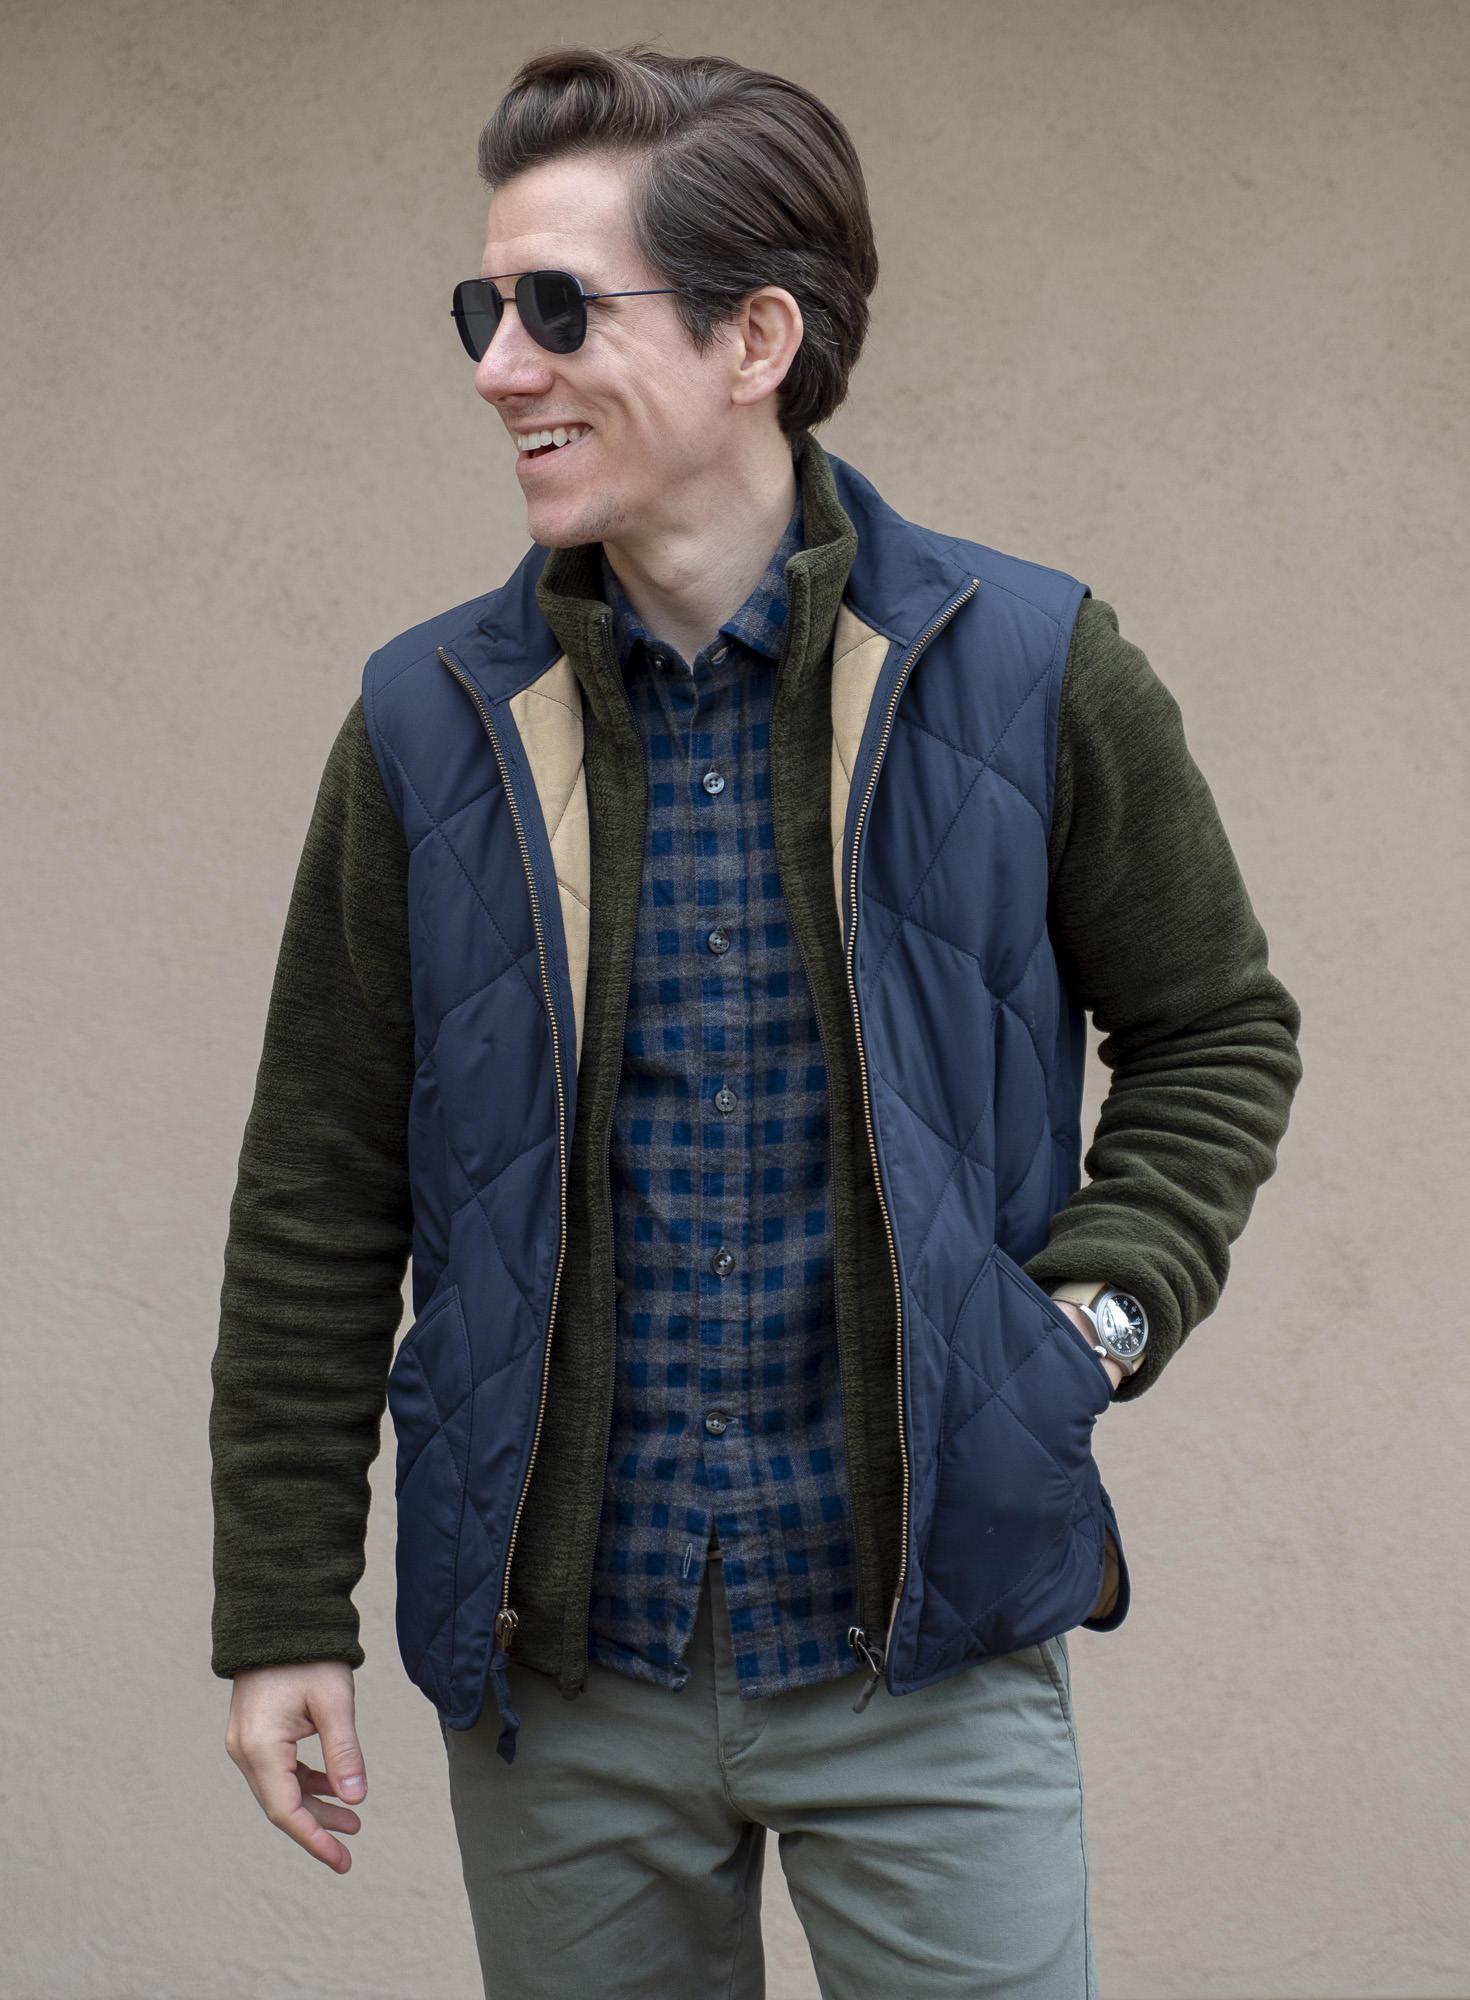 Flannel shirt fleece and vest